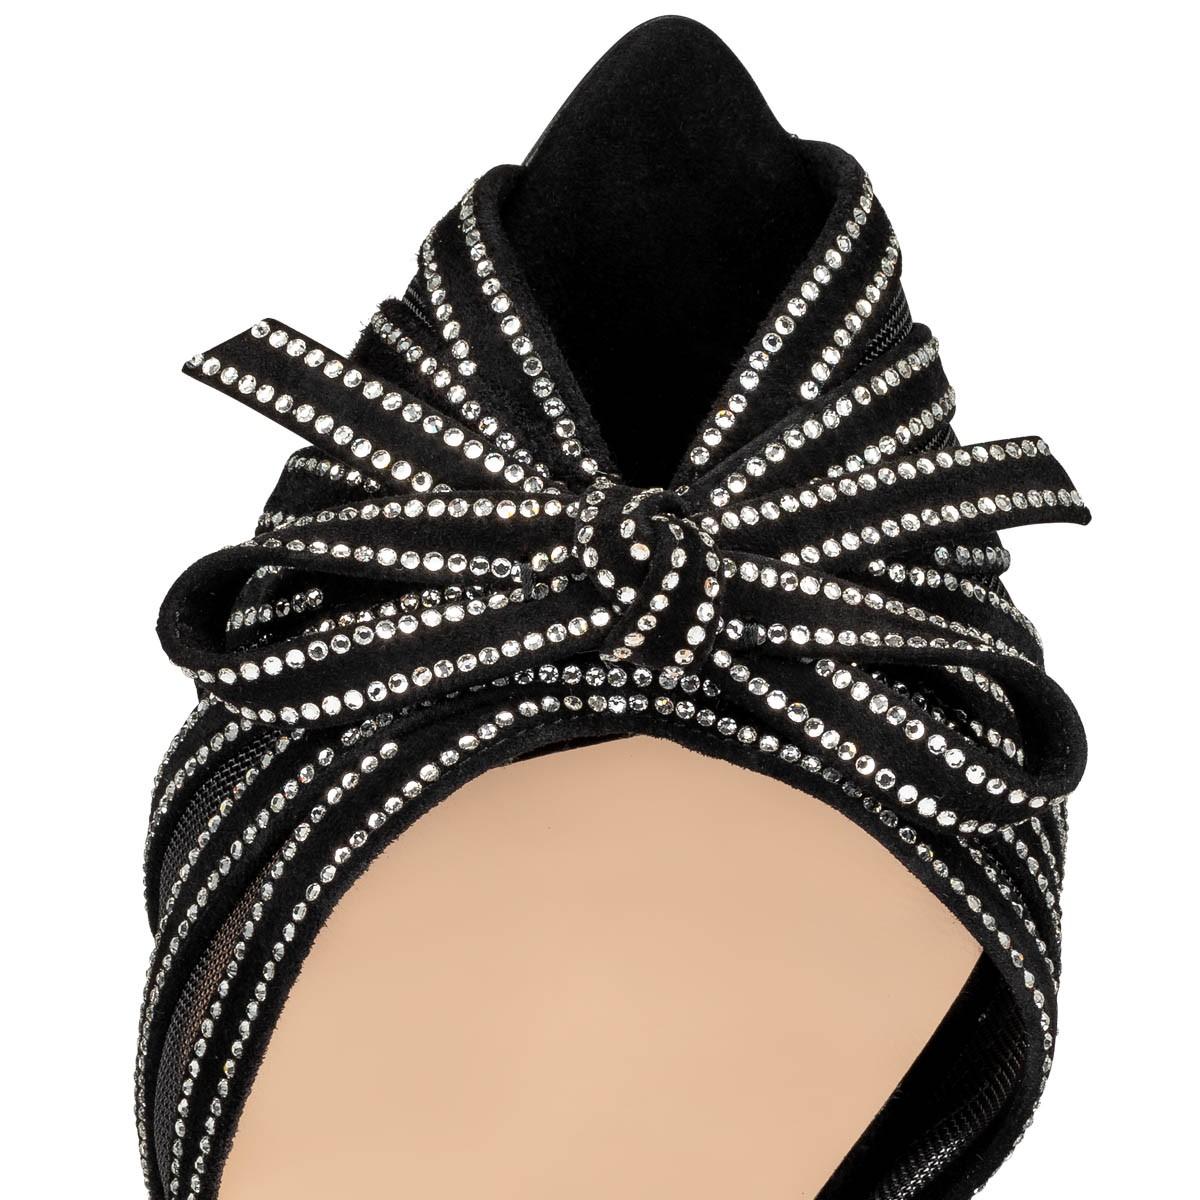 Shoes - Araborda - Christian Louboutin